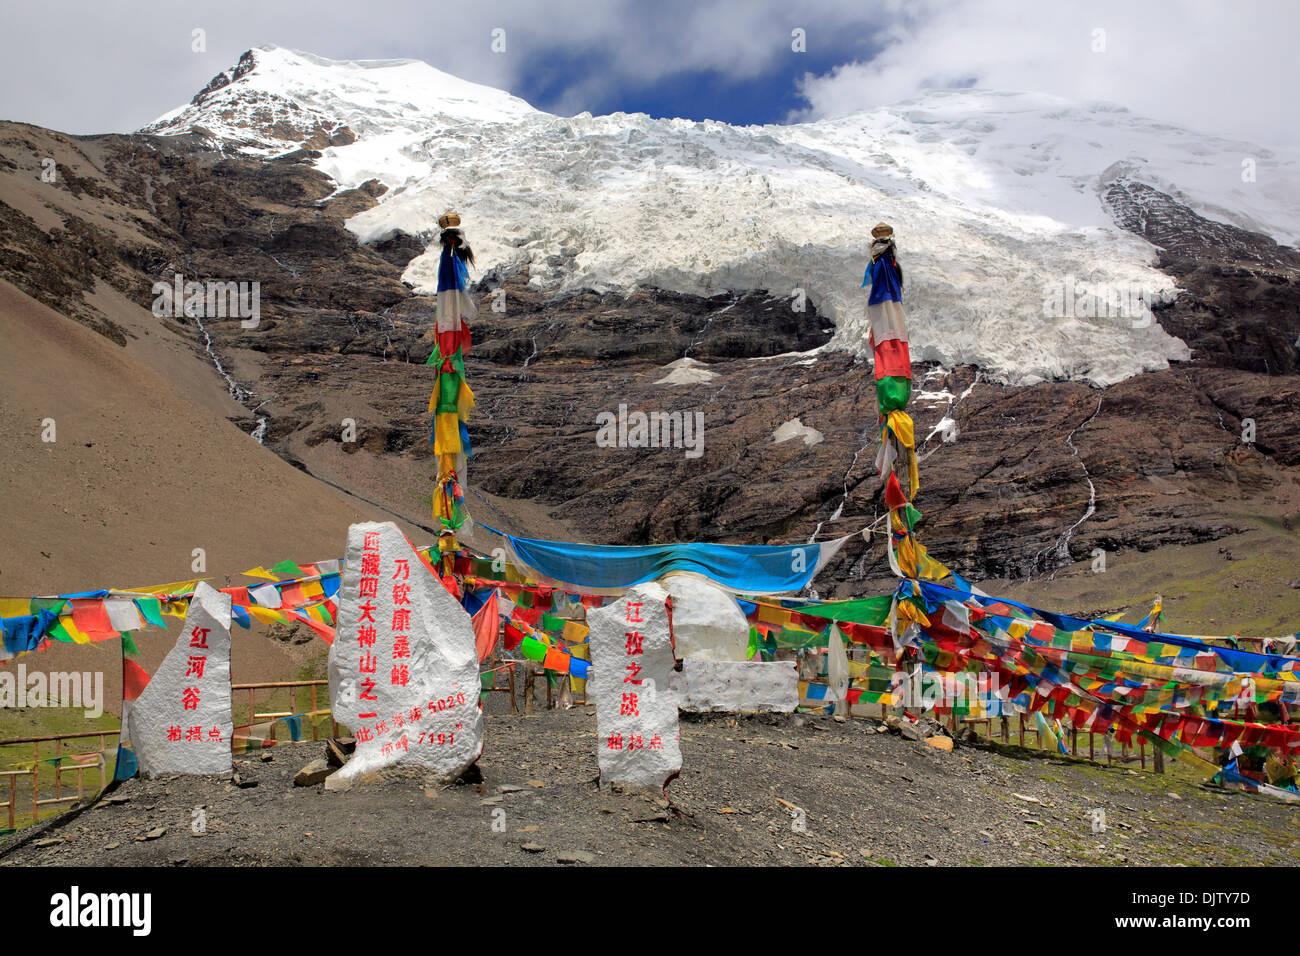 Karola Glacier (5560 m), Shannan Prefecture, Tibet, China - Stock Image